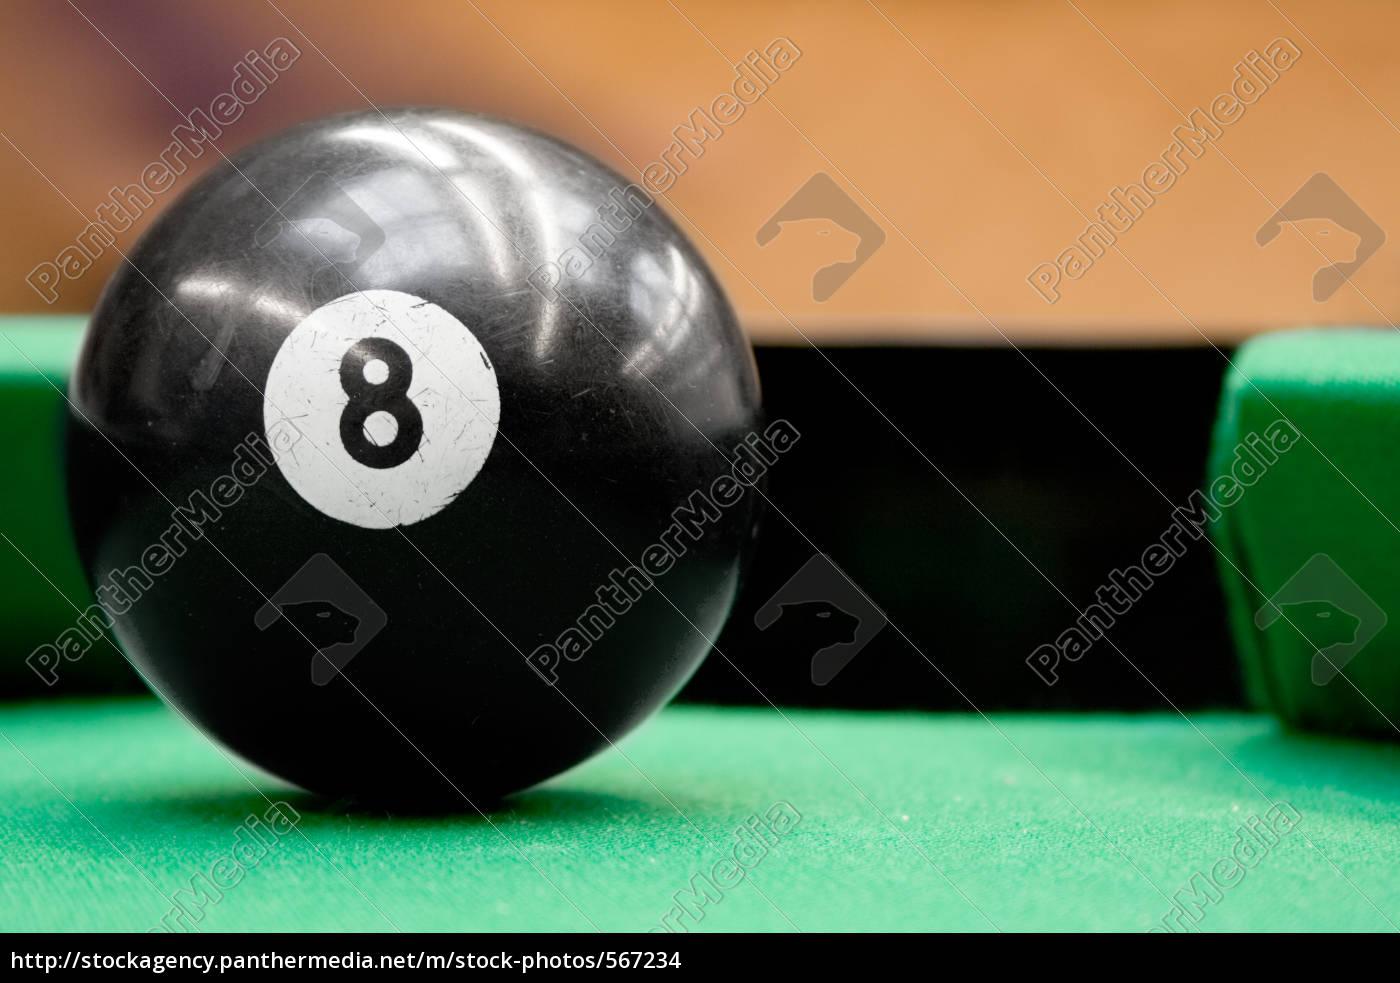 billiard, ball, no., 8 - 567234